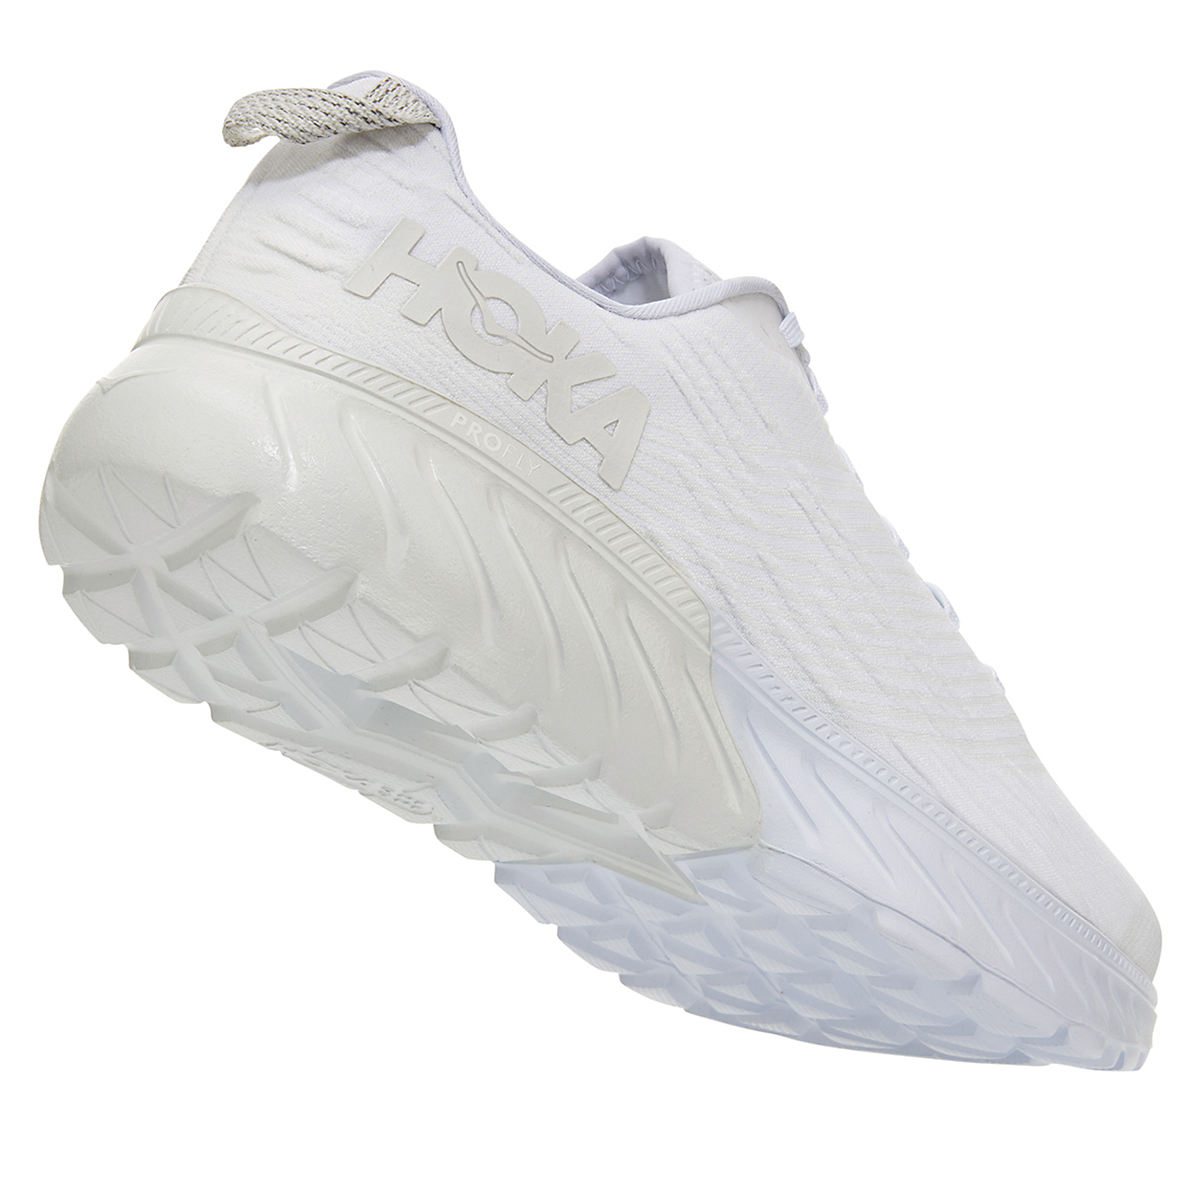 Women's Hoka One One Mach 3 Running Shoe - Color: White (Regular Width) - Size: 5, White, large, image 3